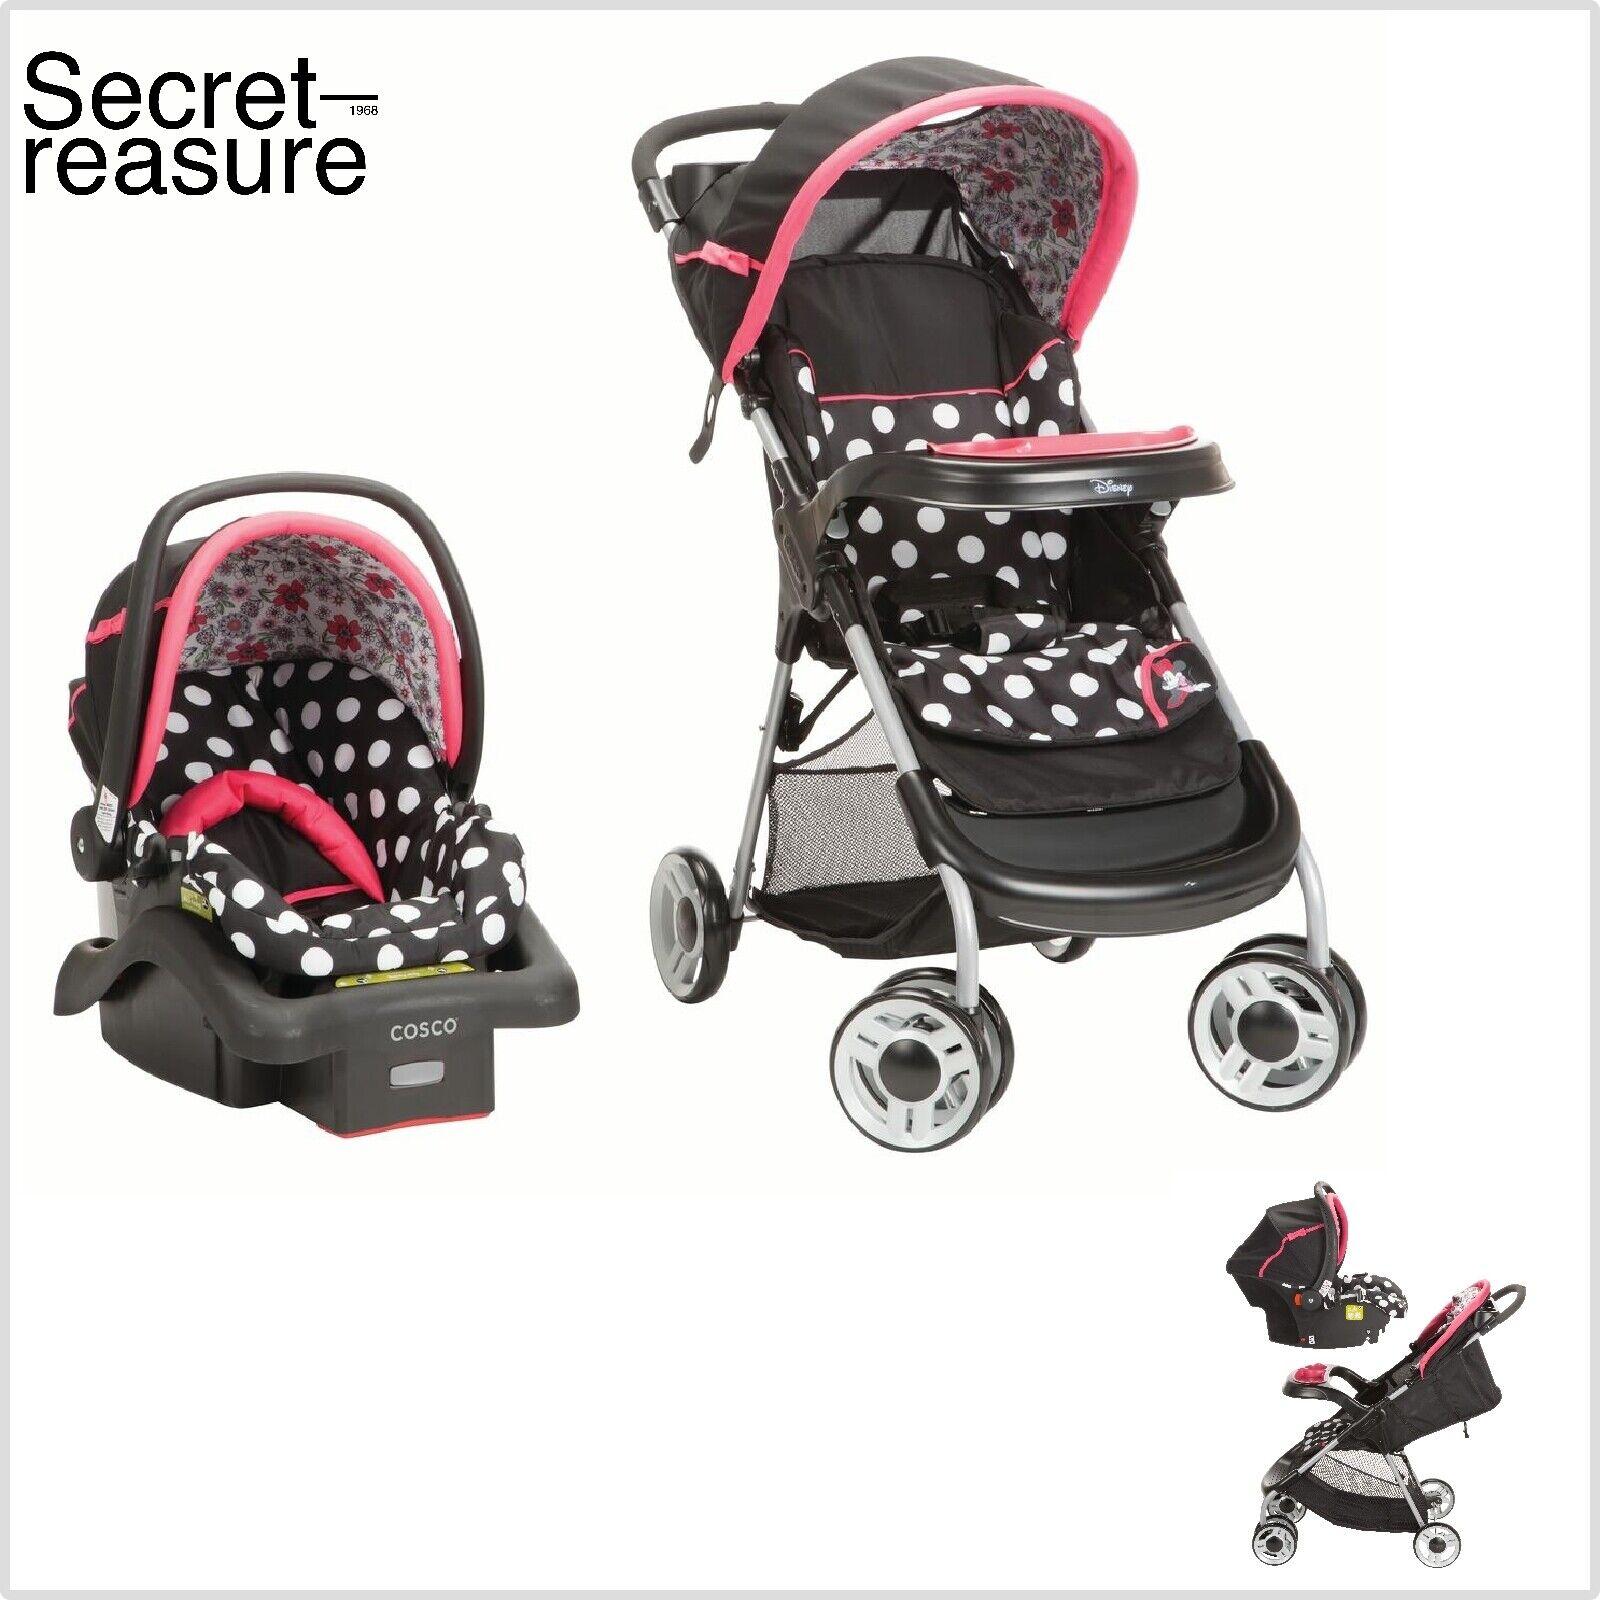 Travel System For Girls Lightweight Infant Car Seat Set Newb